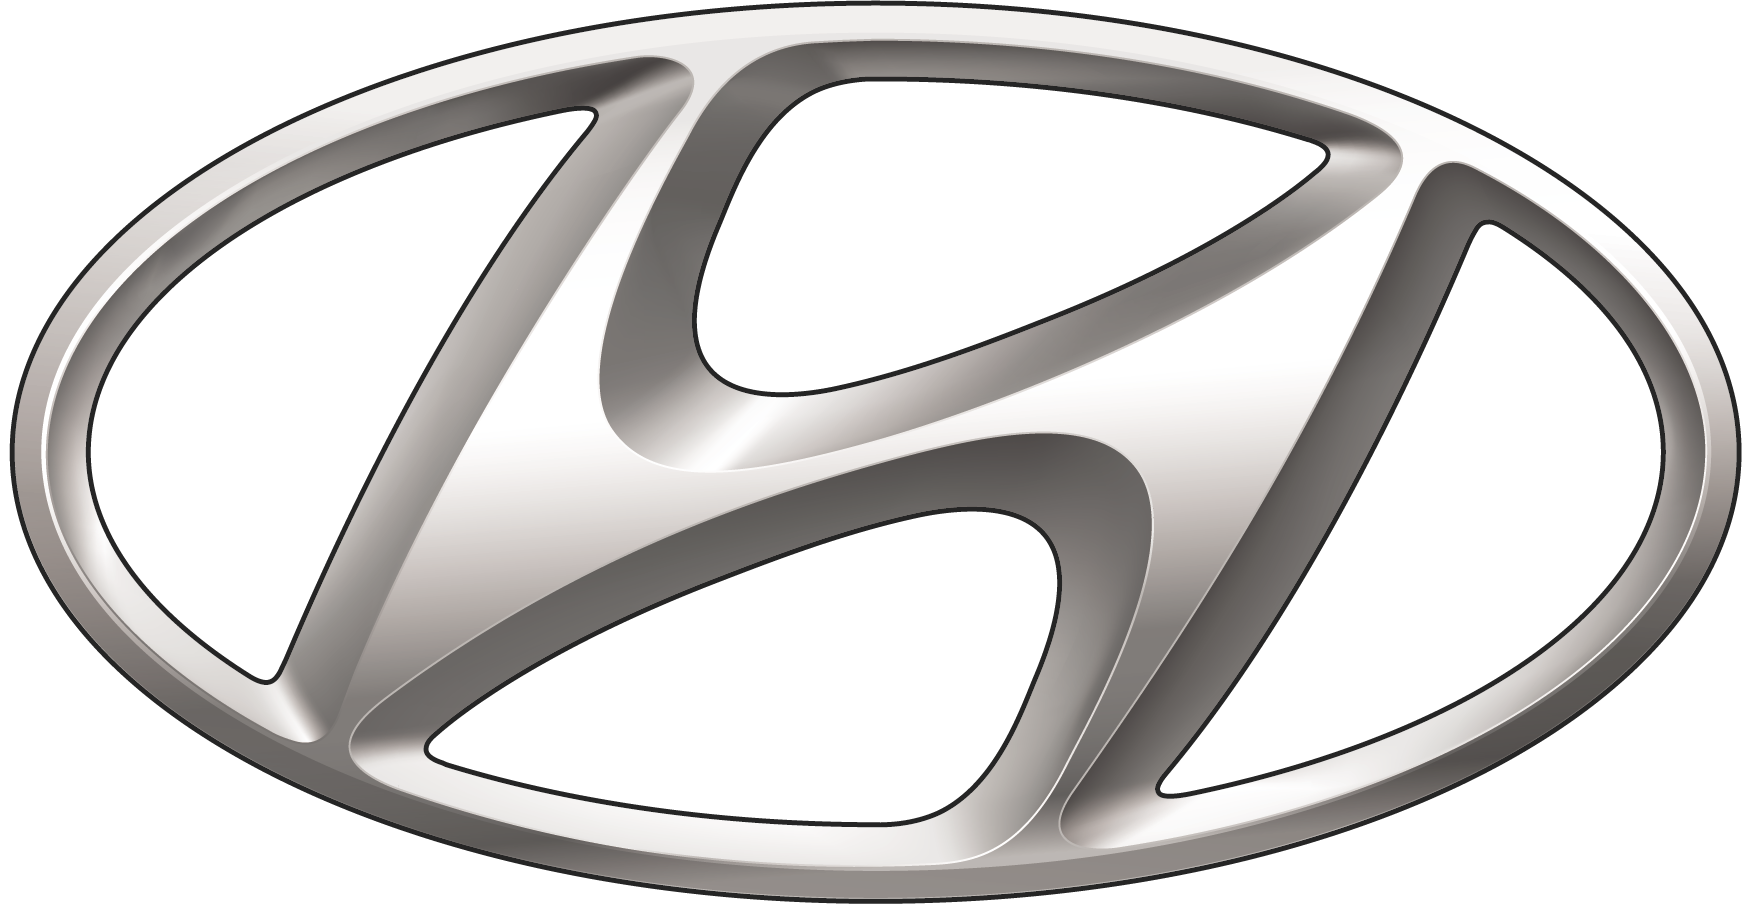 Chevrolet Car Logo PNG Image Hyundai logo, Car logos